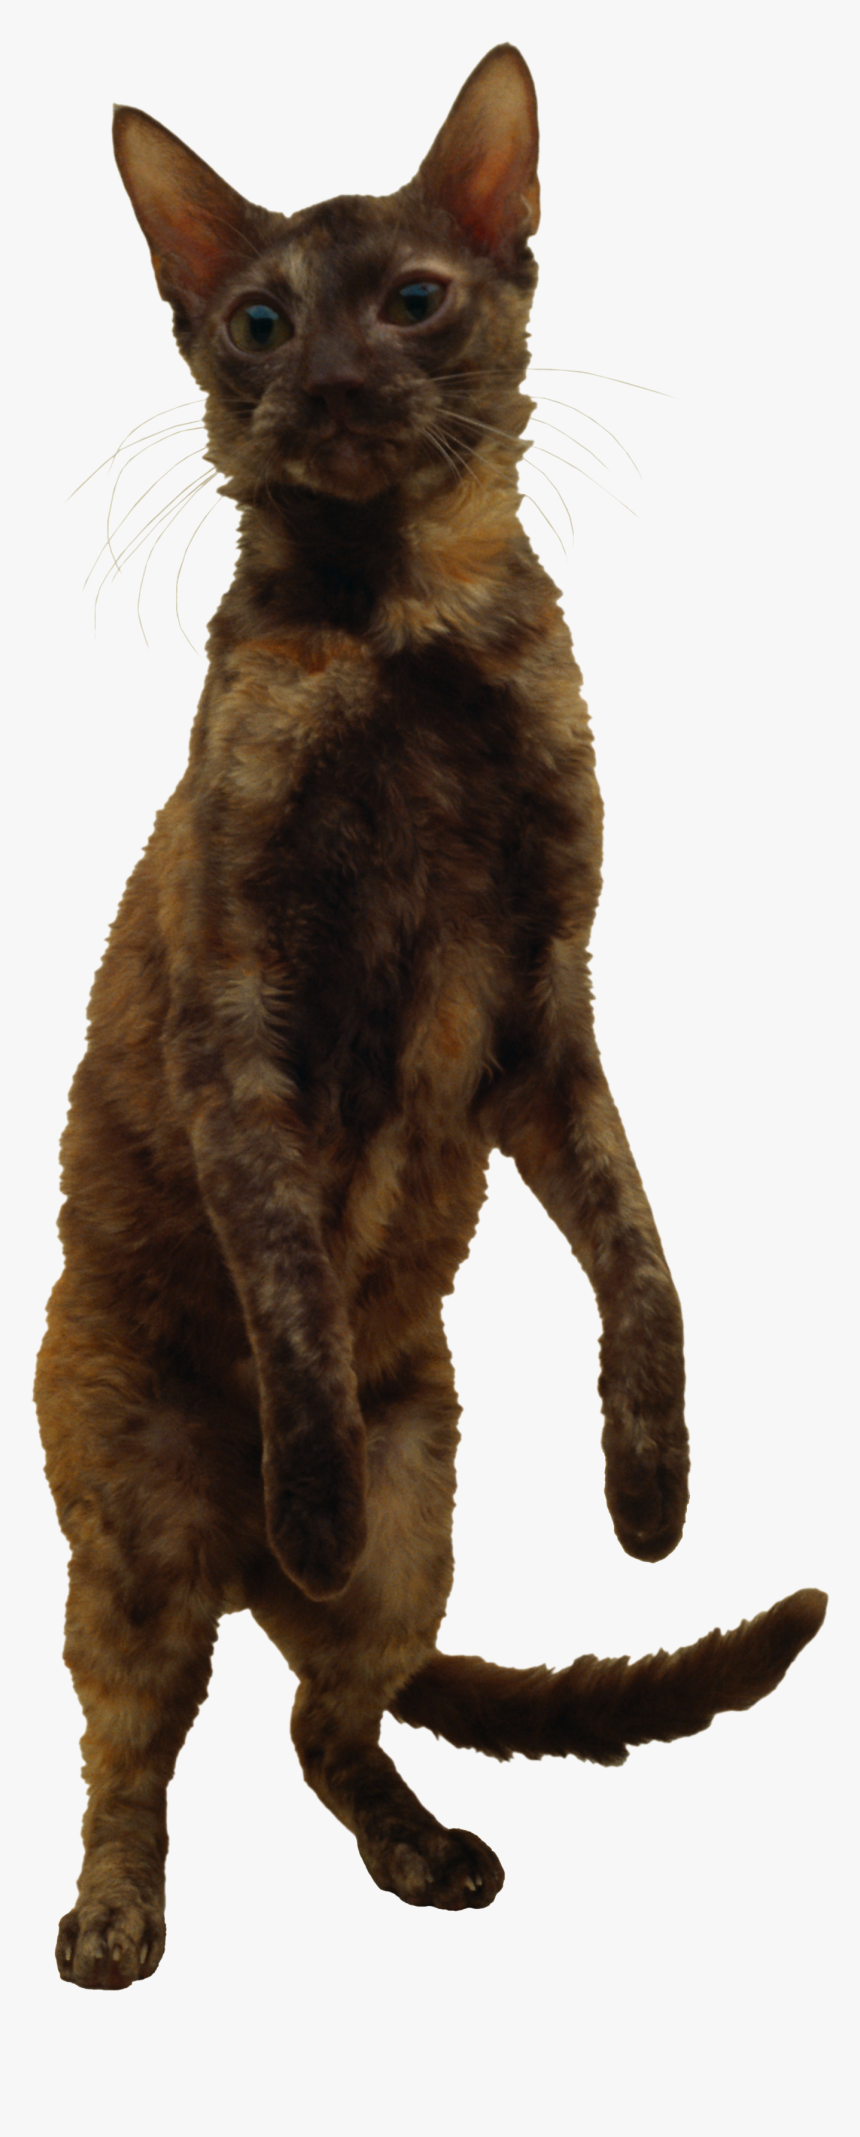 Cat Png - German Rex Png, Transparent Png, Free Download